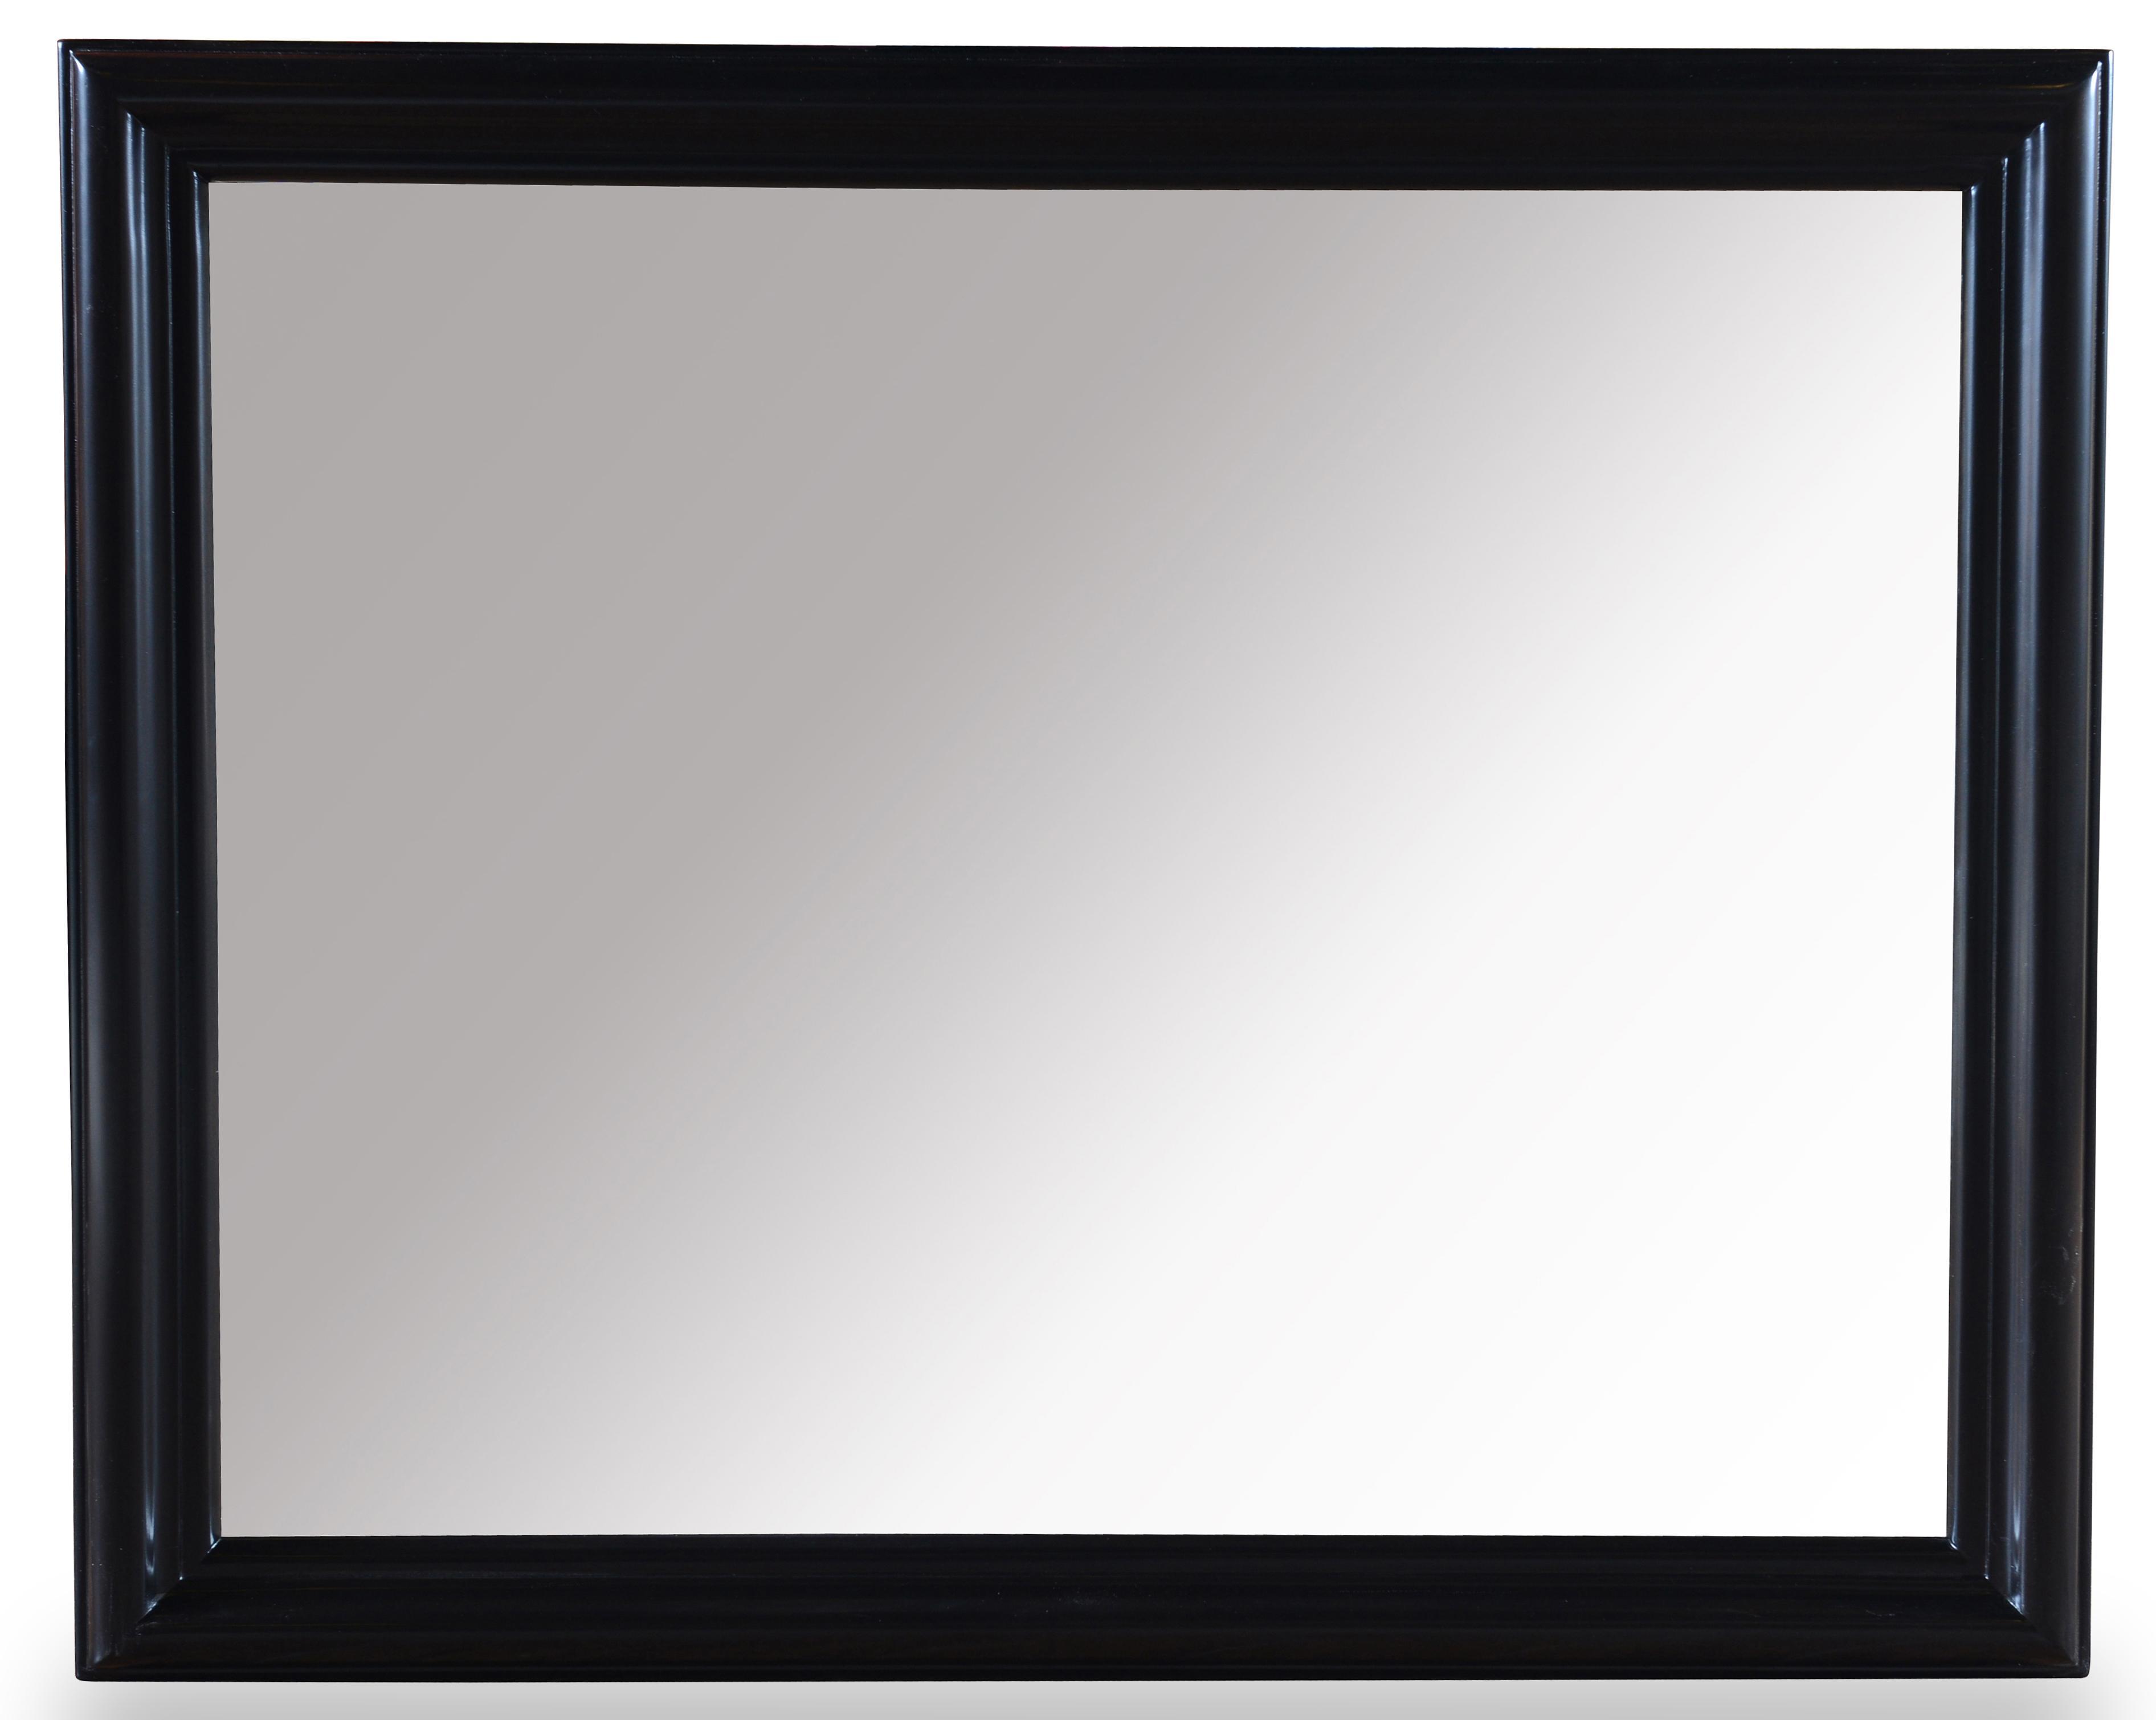 A.R.T. Furniture Inc Cosmopolitan Landscape Mirror - Item Number: 208121-1815